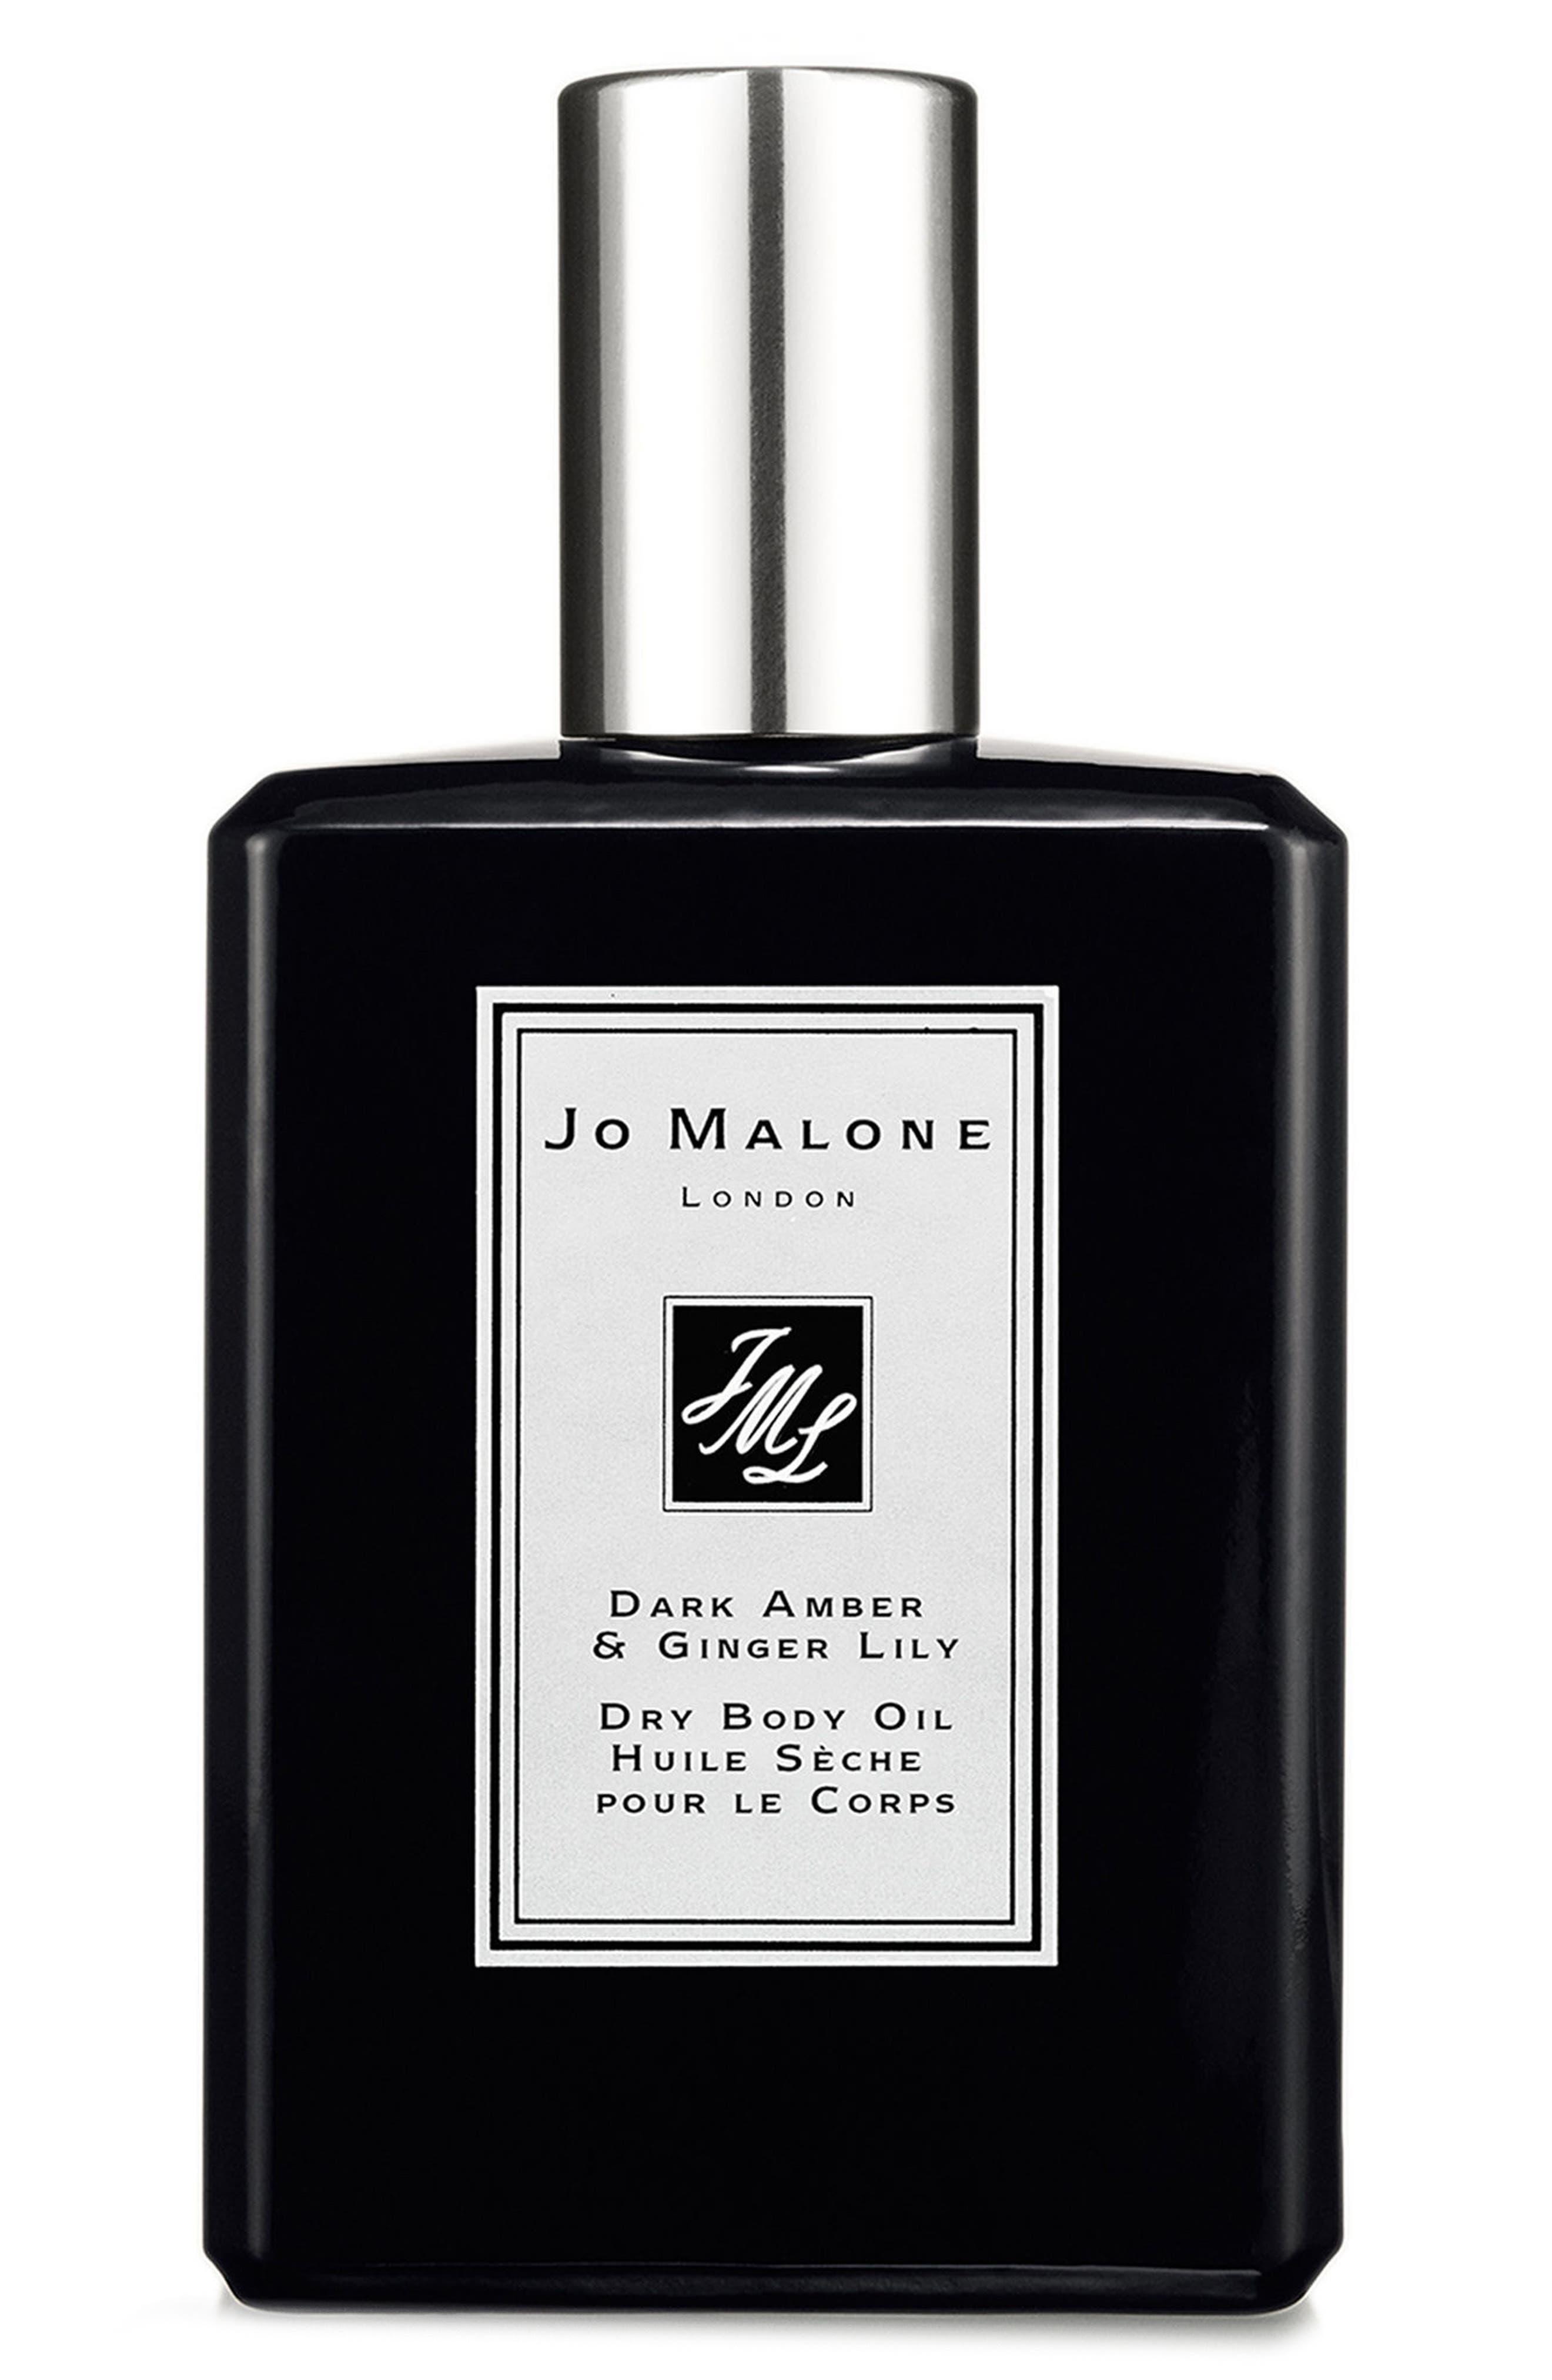 Jo Malone London™ Dark Amber & Ginger Lily Dry Body Oil